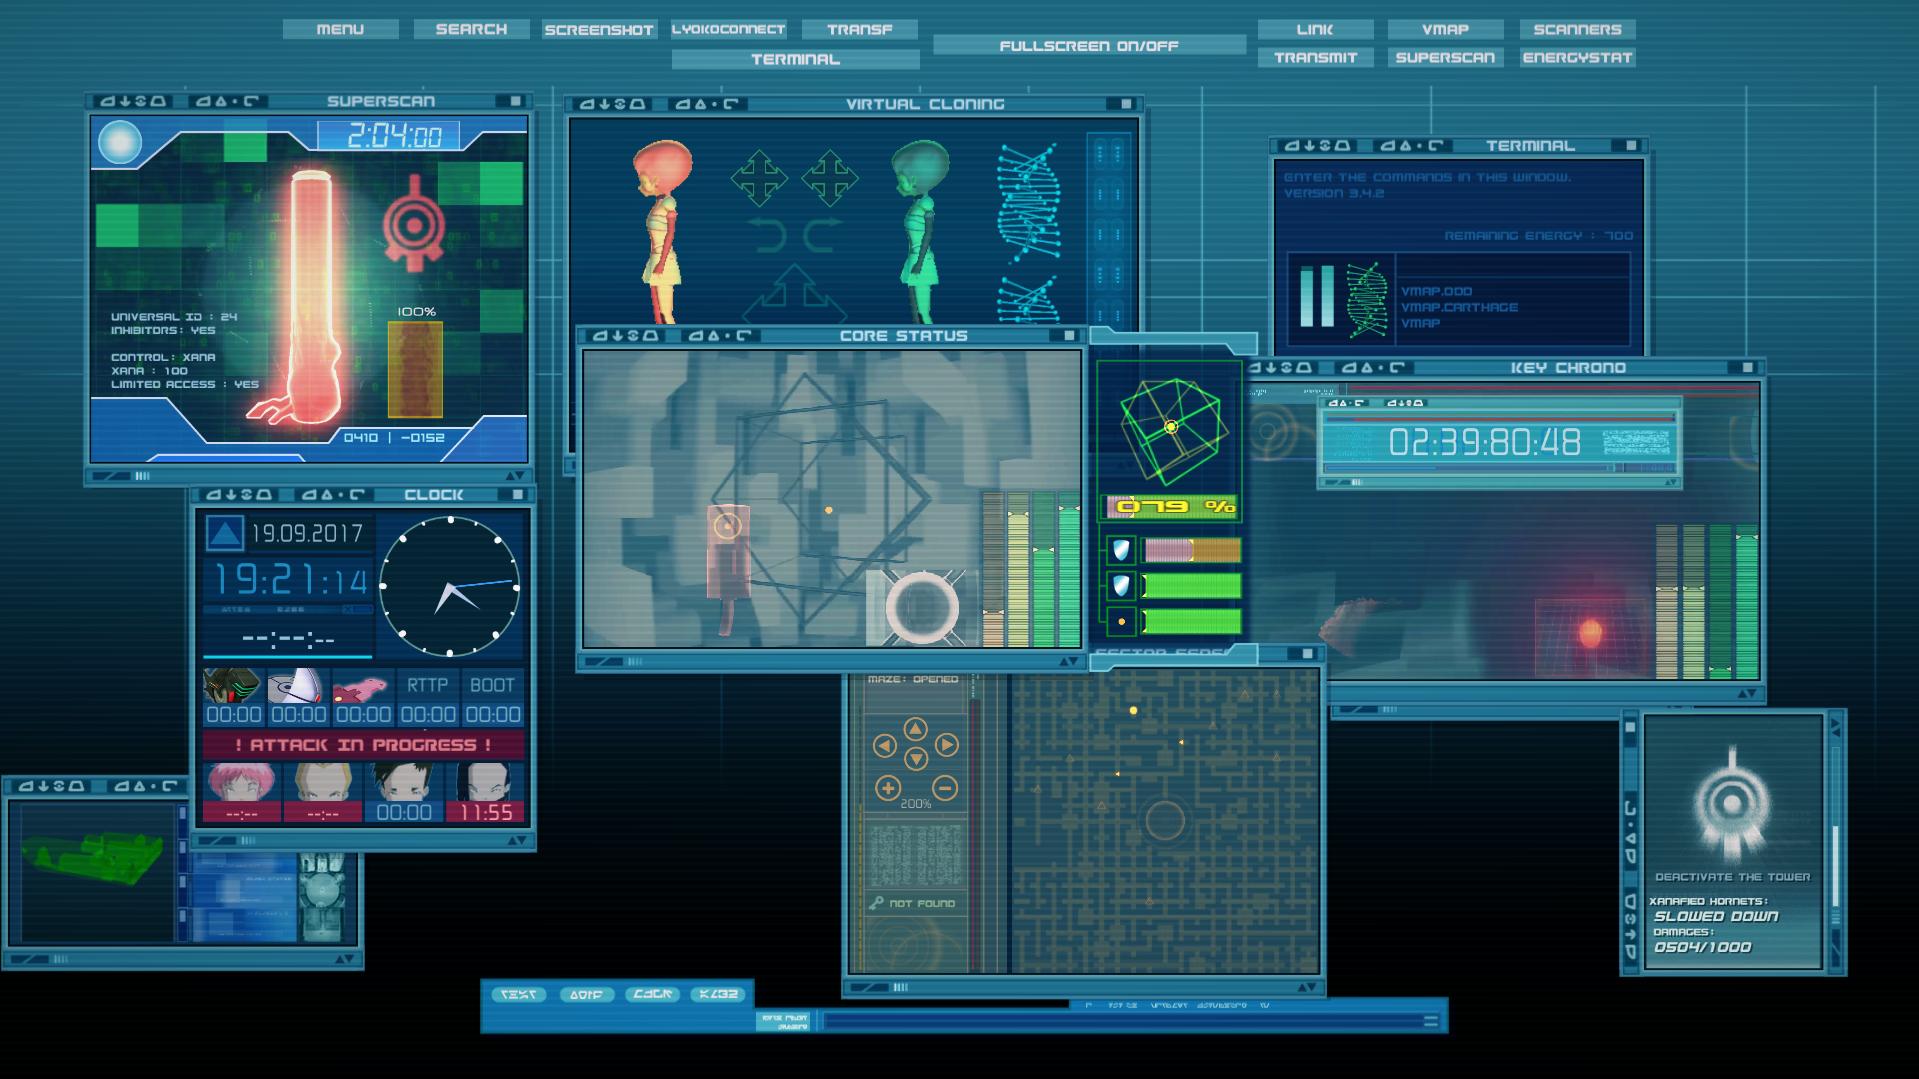 IFSCL 342 Screen